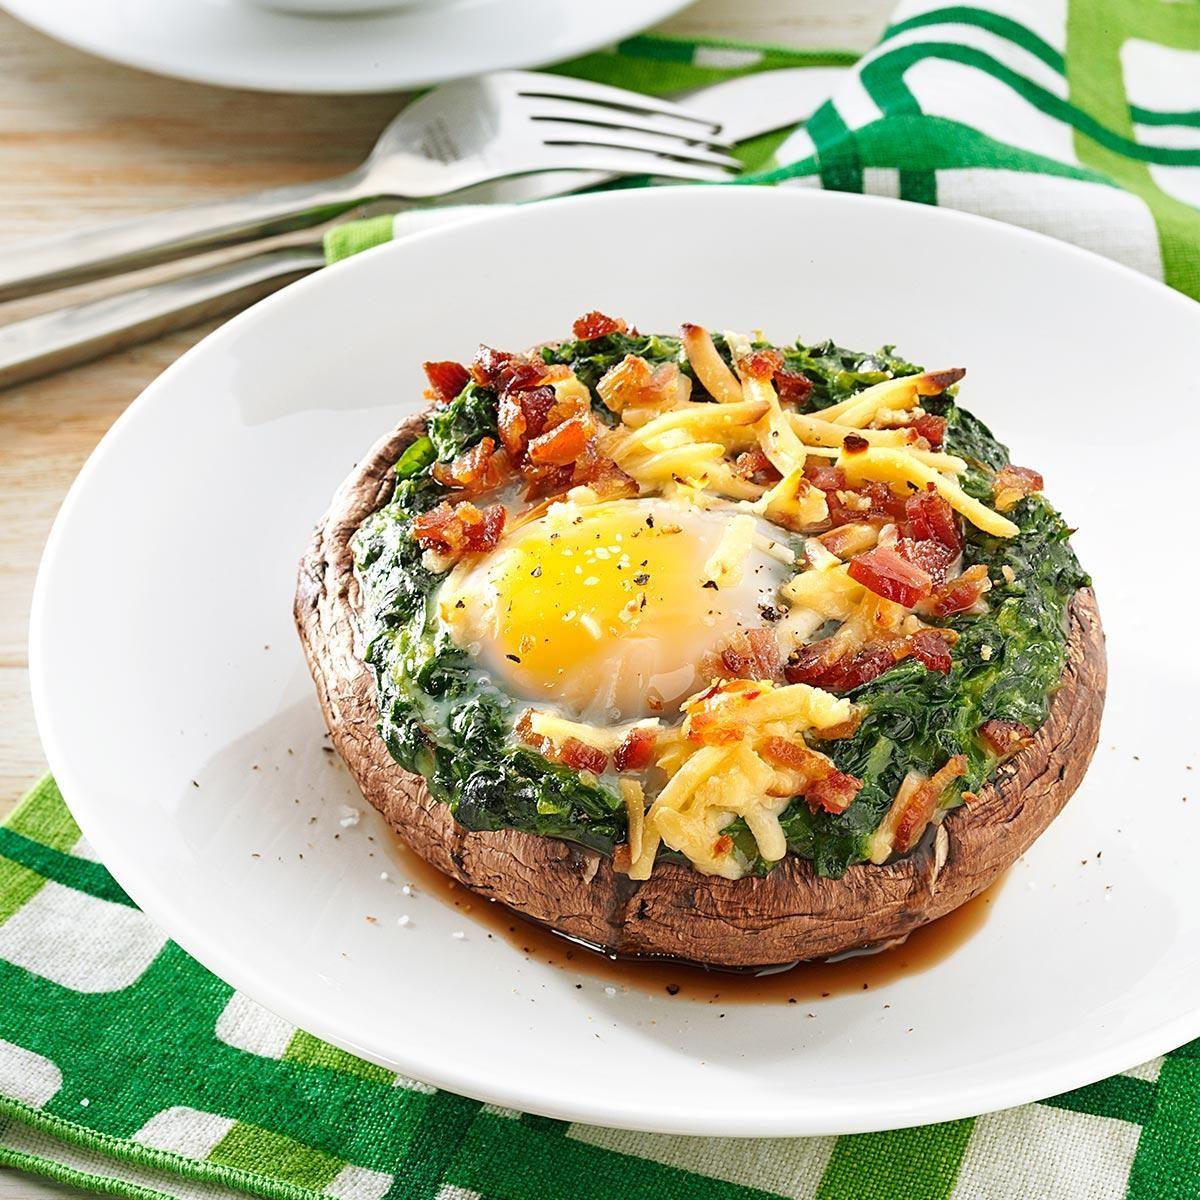 Brunch-Style Portobello Mushrooms Recipe | Taste of Home